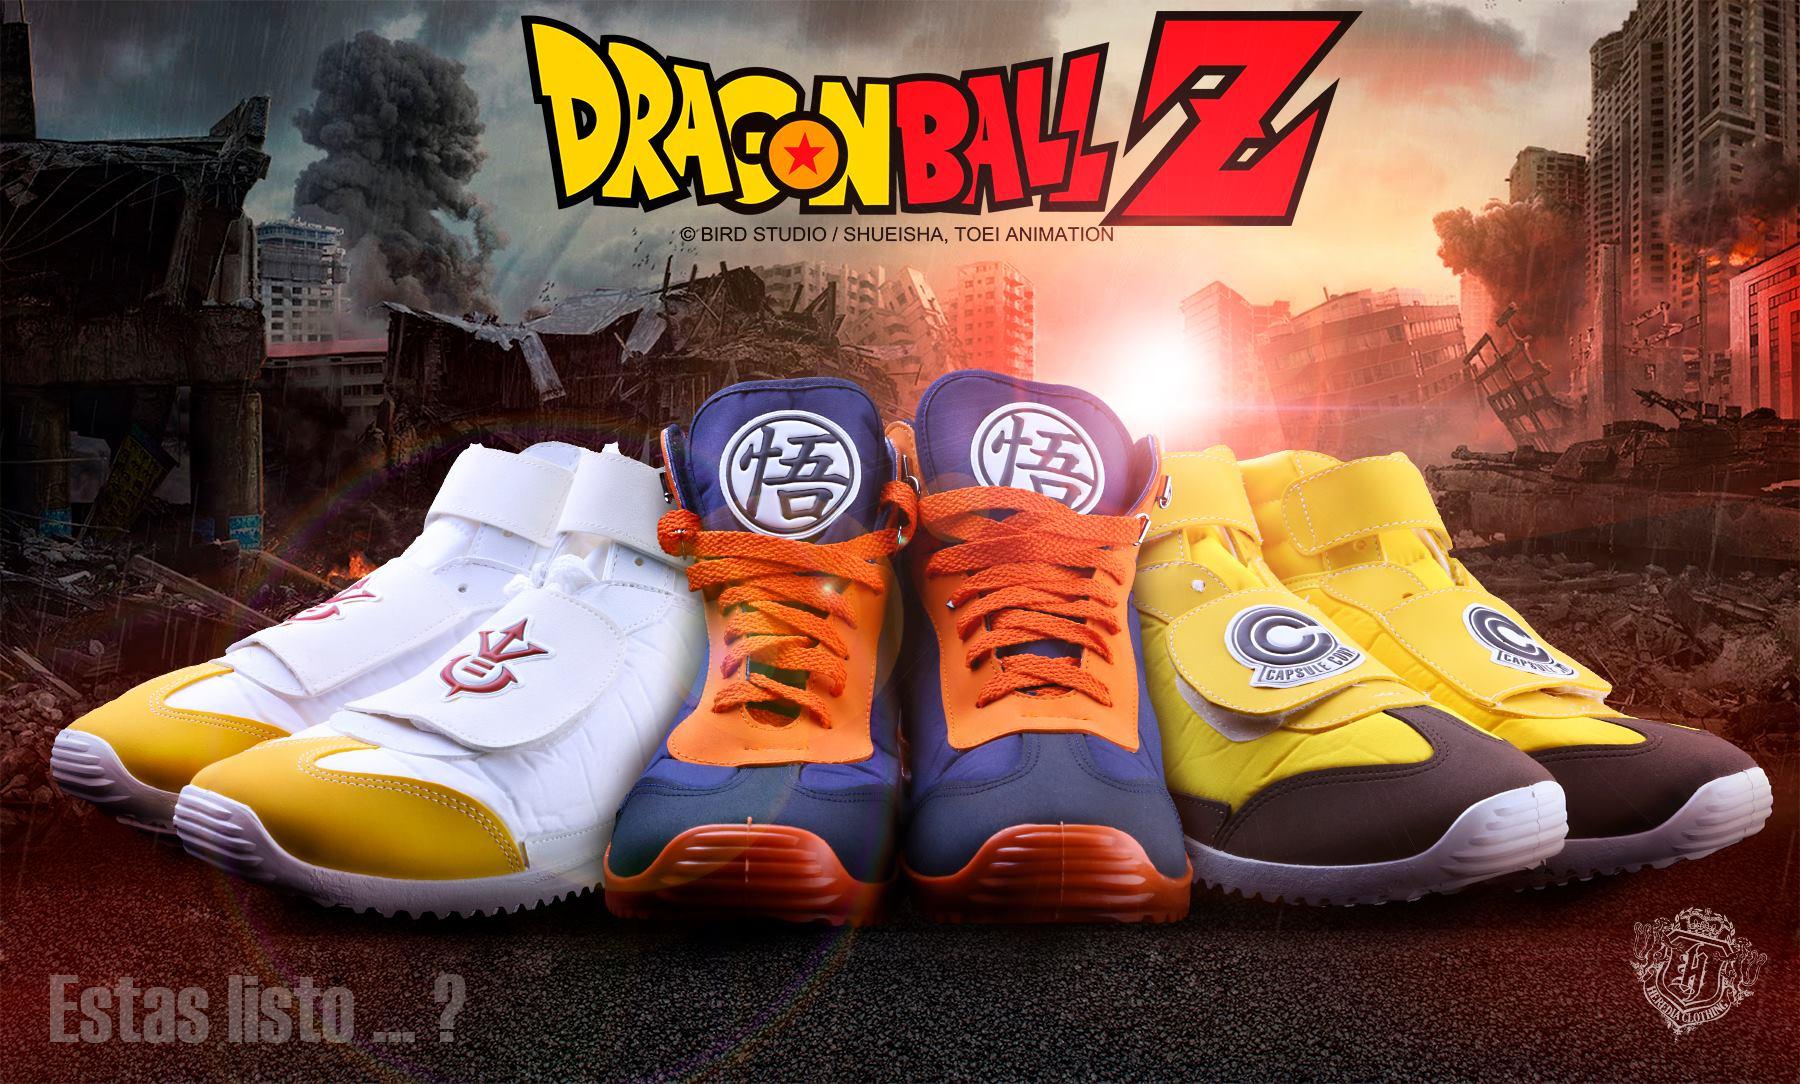 Dragonball-Z-Shoes-Mexican-Goku-Sayyan-Haruhichan.com_